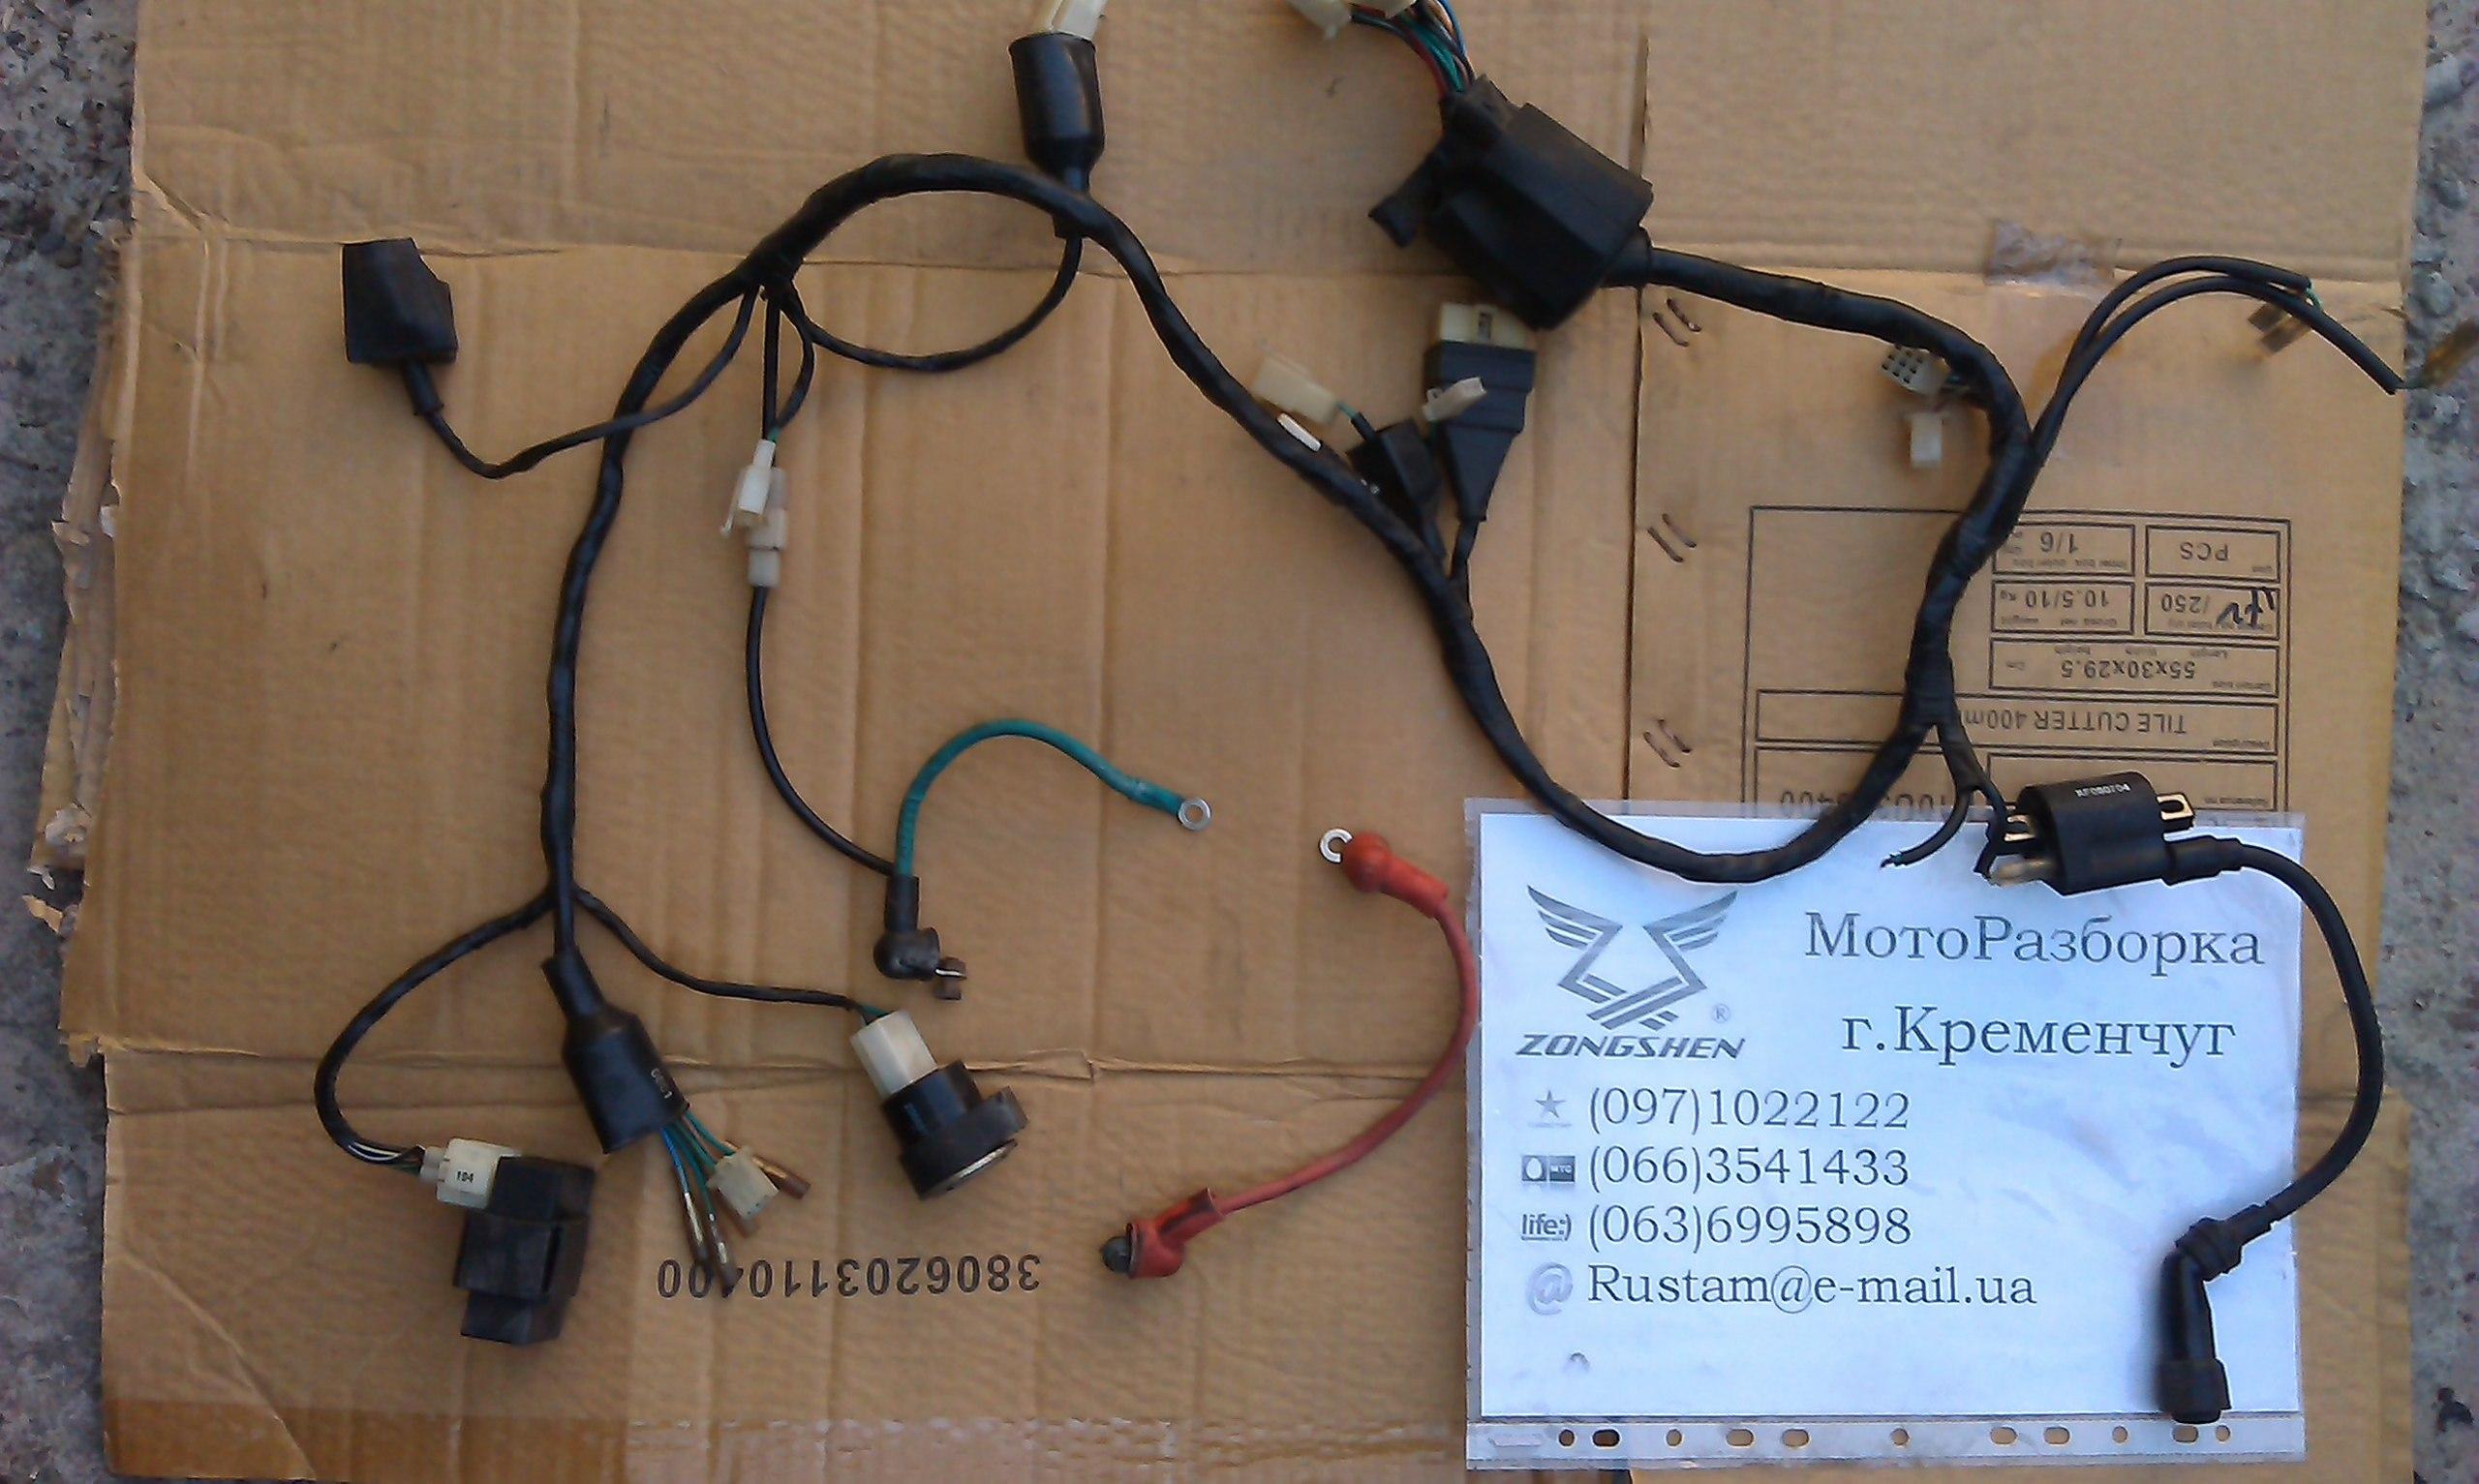 МотоРазборка г.Кременчуг Zongshen 200-250, Suzuki bandit 400-1, Venom 200 PDjY4u7Zd1E